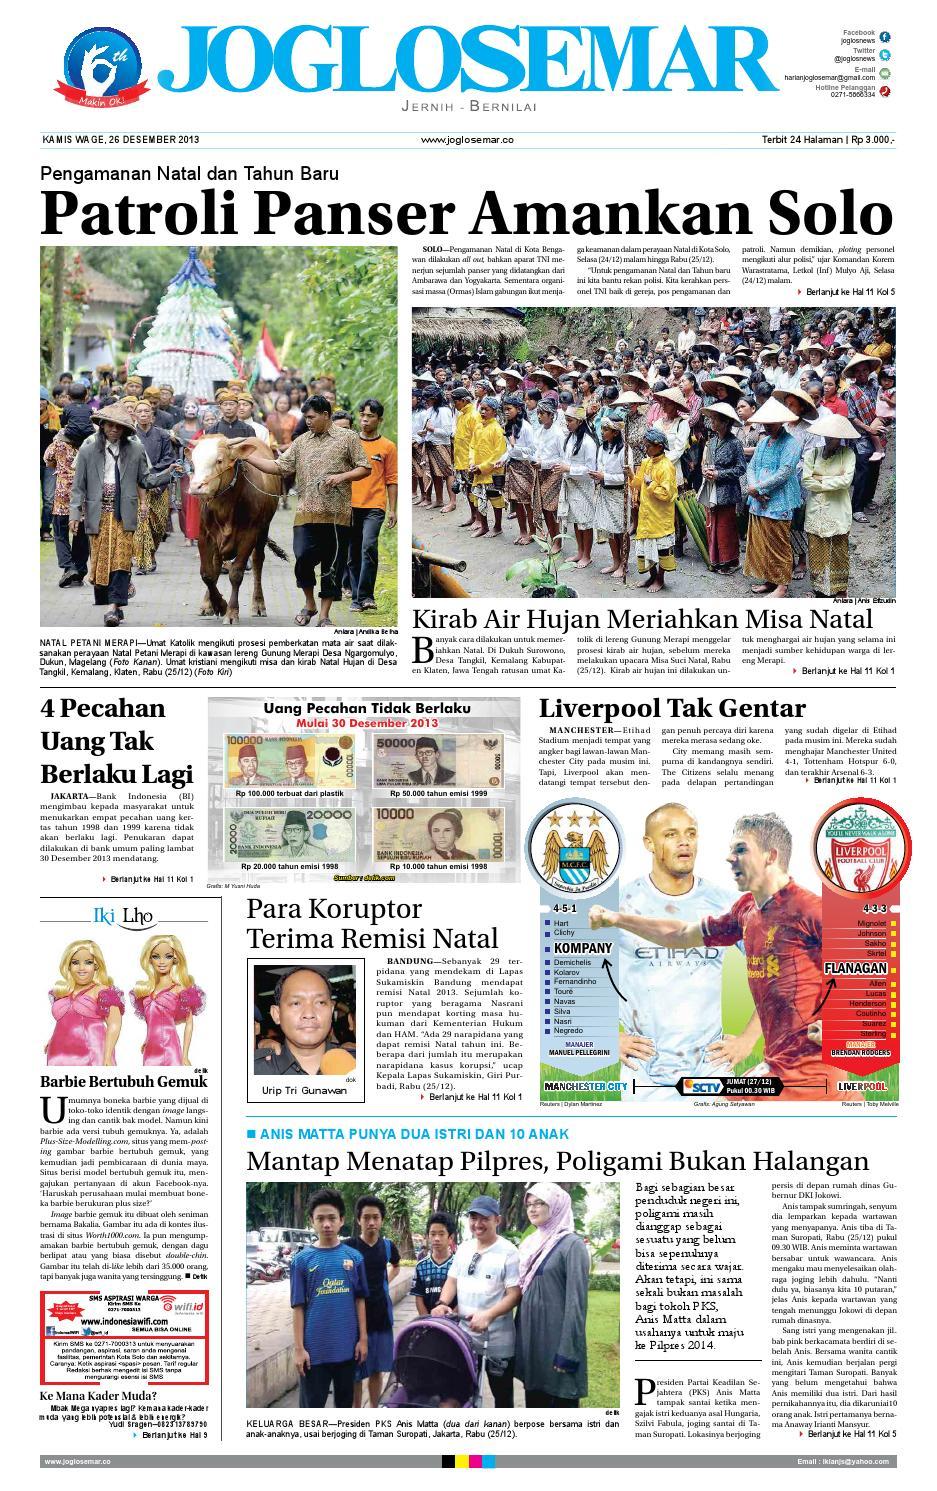 Epaper Edisi 26 Desember 2013 By PT Joglosemar Prima Media